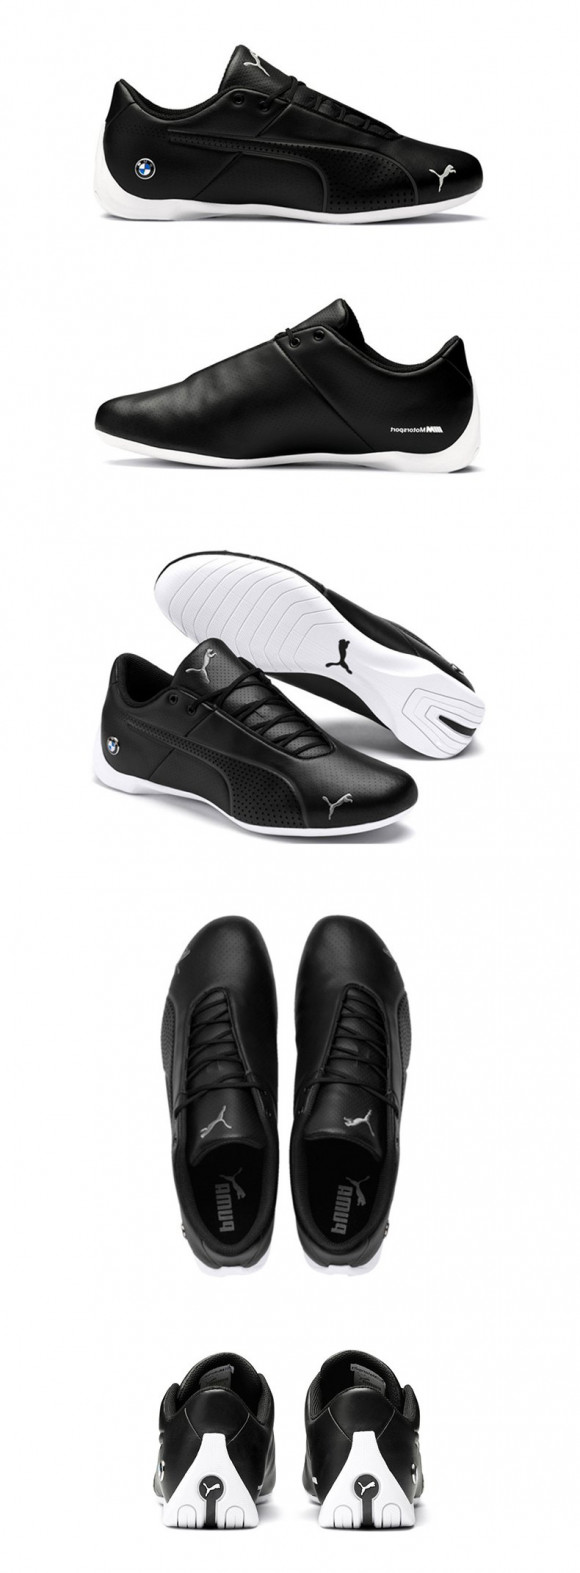 Puma BMW MMS Future Cat Ultra Marathon Running Shoes/Sneakers 306242-04 - 306242-04